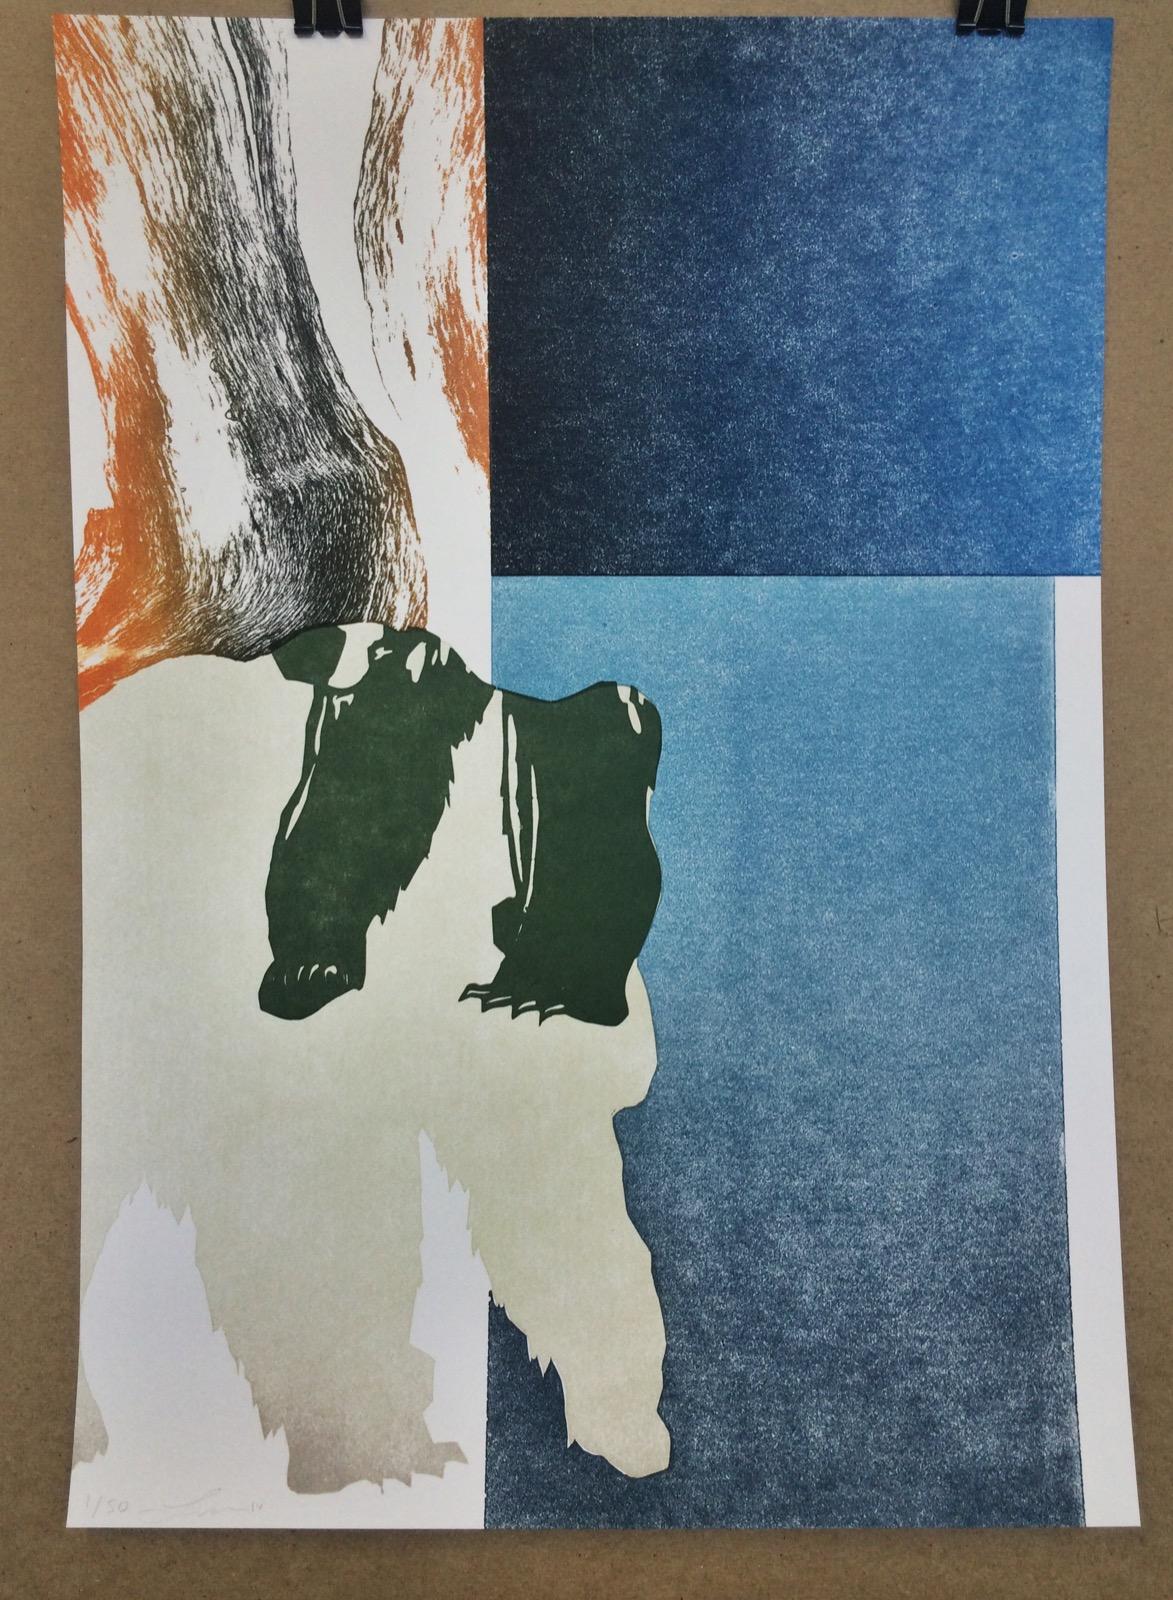 "Letterpress Print  11 x 17""  edition of 50  2016"